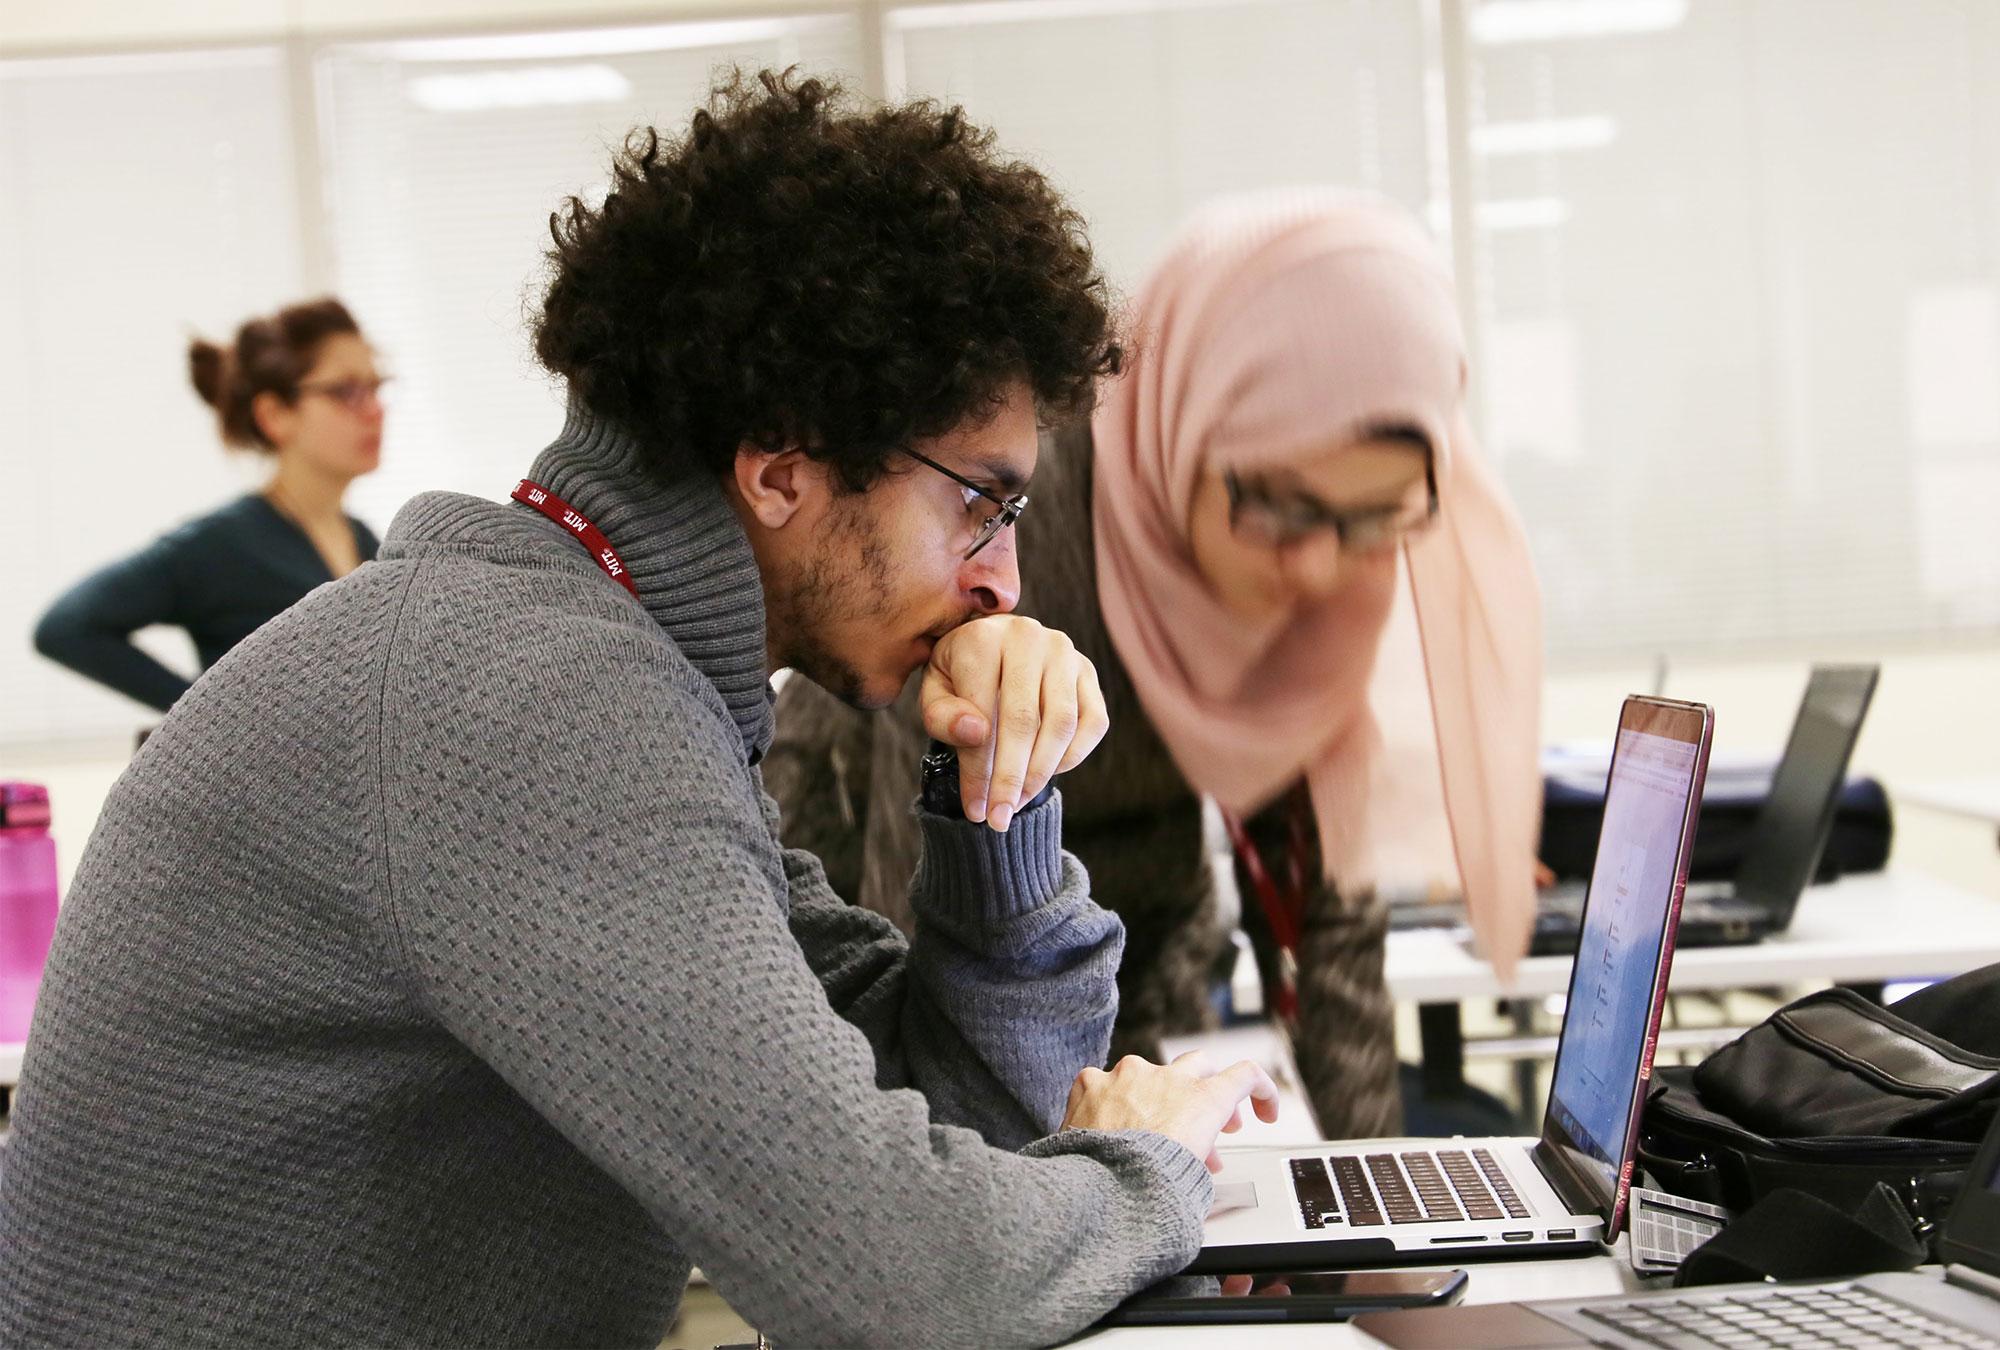 Learners work together during workshop